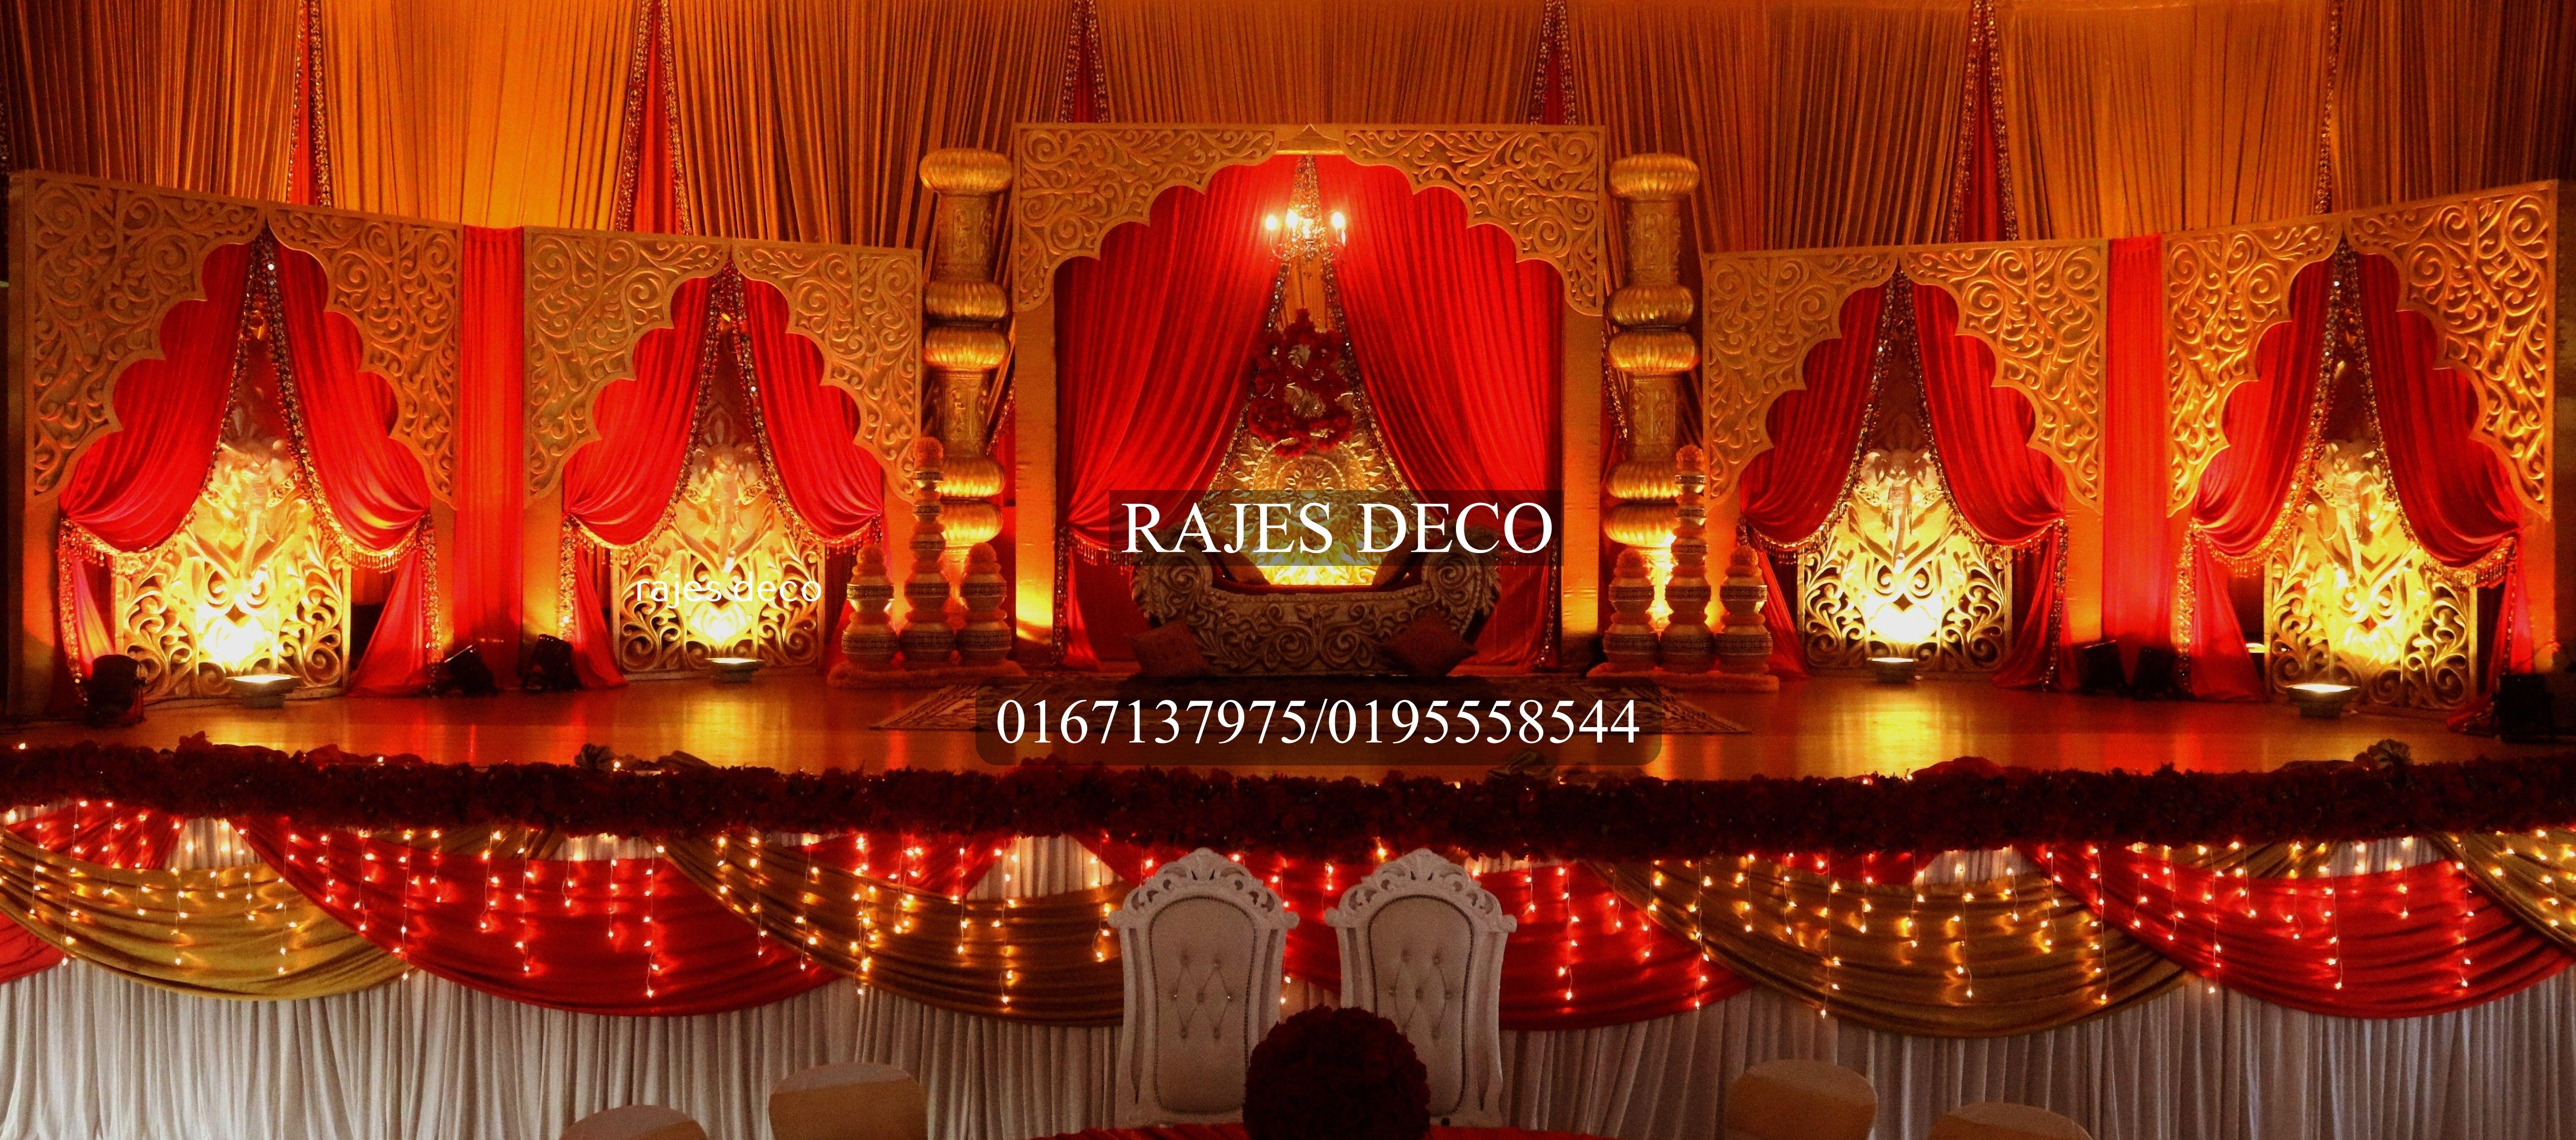 Indian wedding decoration royal mandap rajes deco wedding indian wedding decoration royal mandap junglespirit Choice Image